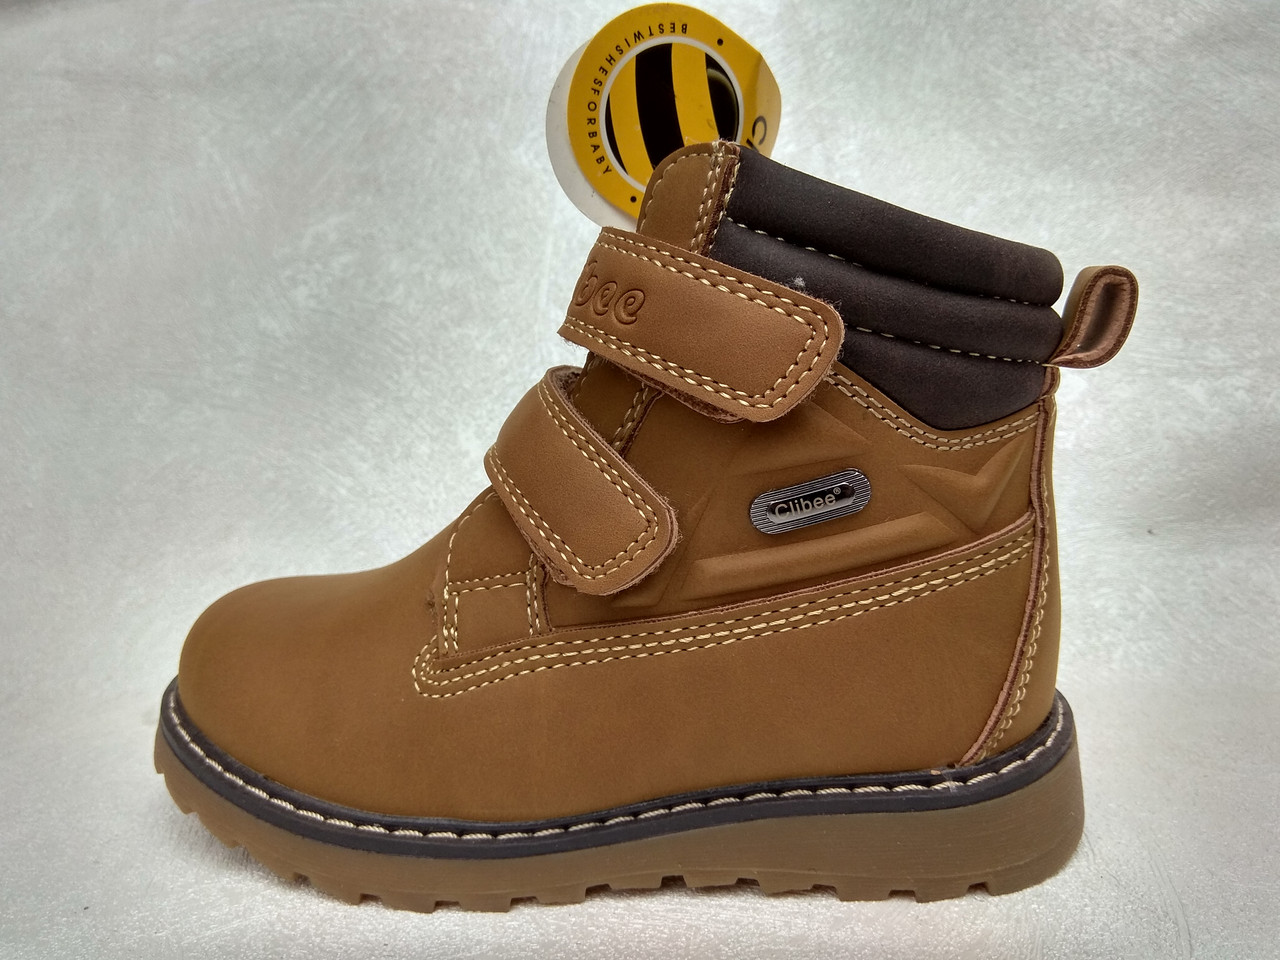 4f862ea5a90e44 Зимние ботинки для мальчиков Clibee (р.26-31), цена 395,49 грн ...